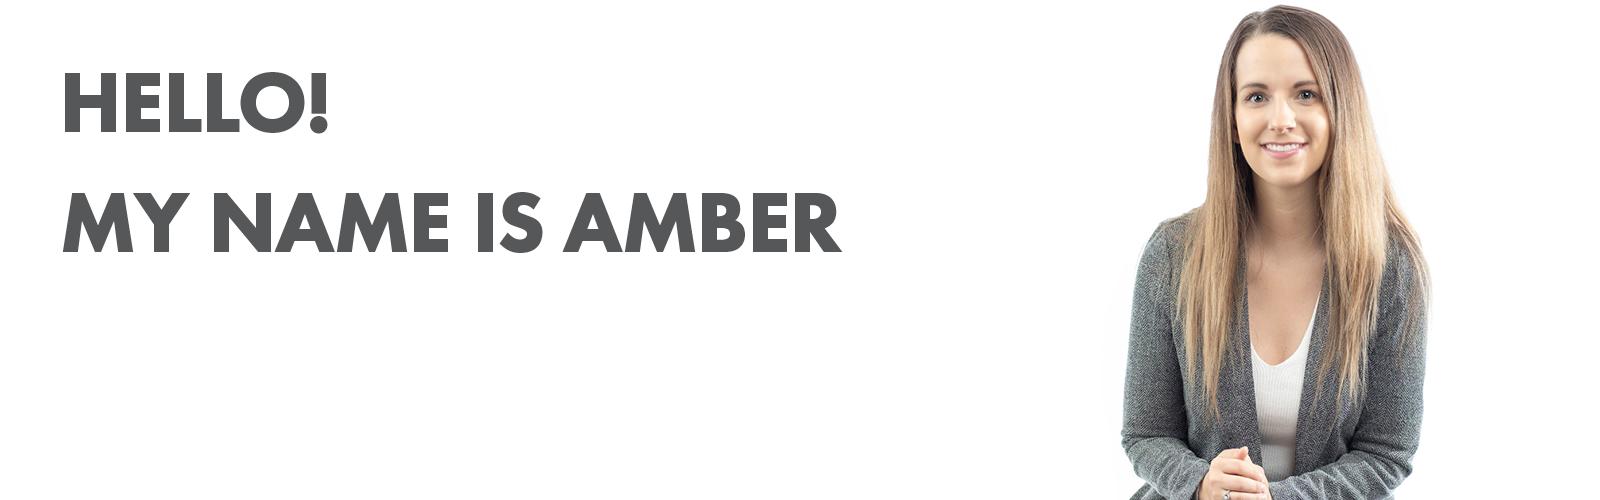 meet amber | designer at fbc remodel